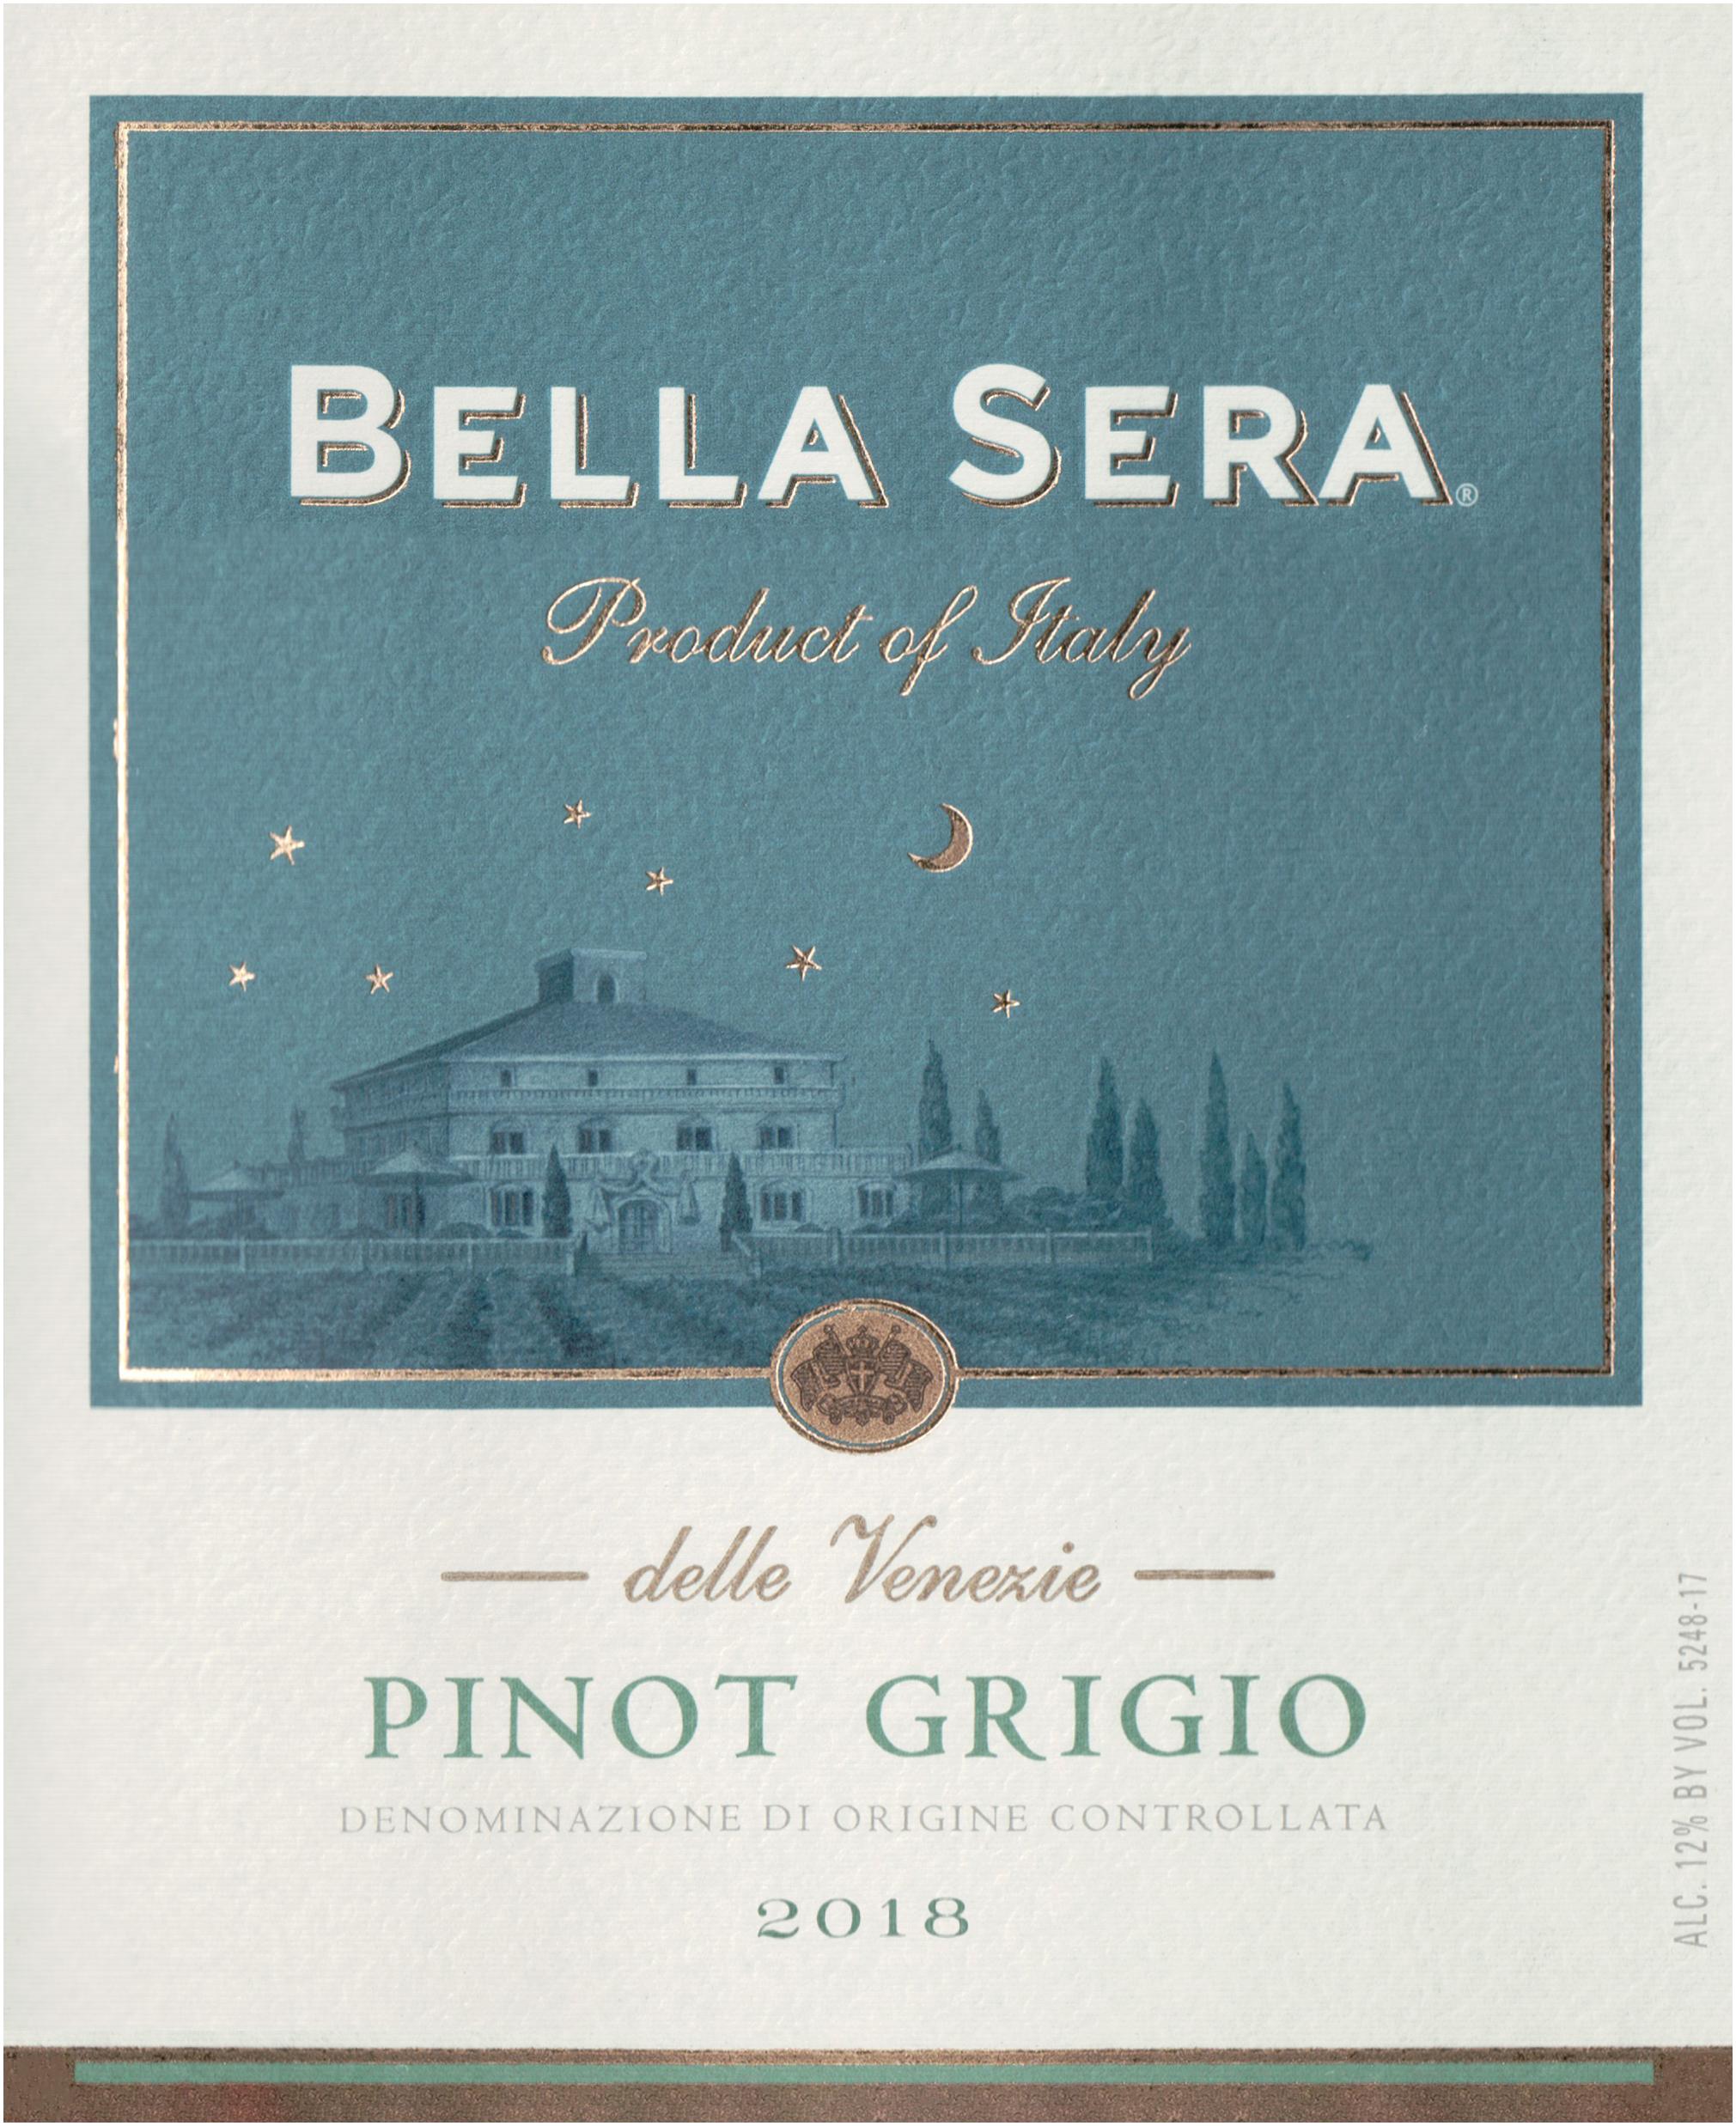 Bella Sera Pinot Grigio 2018